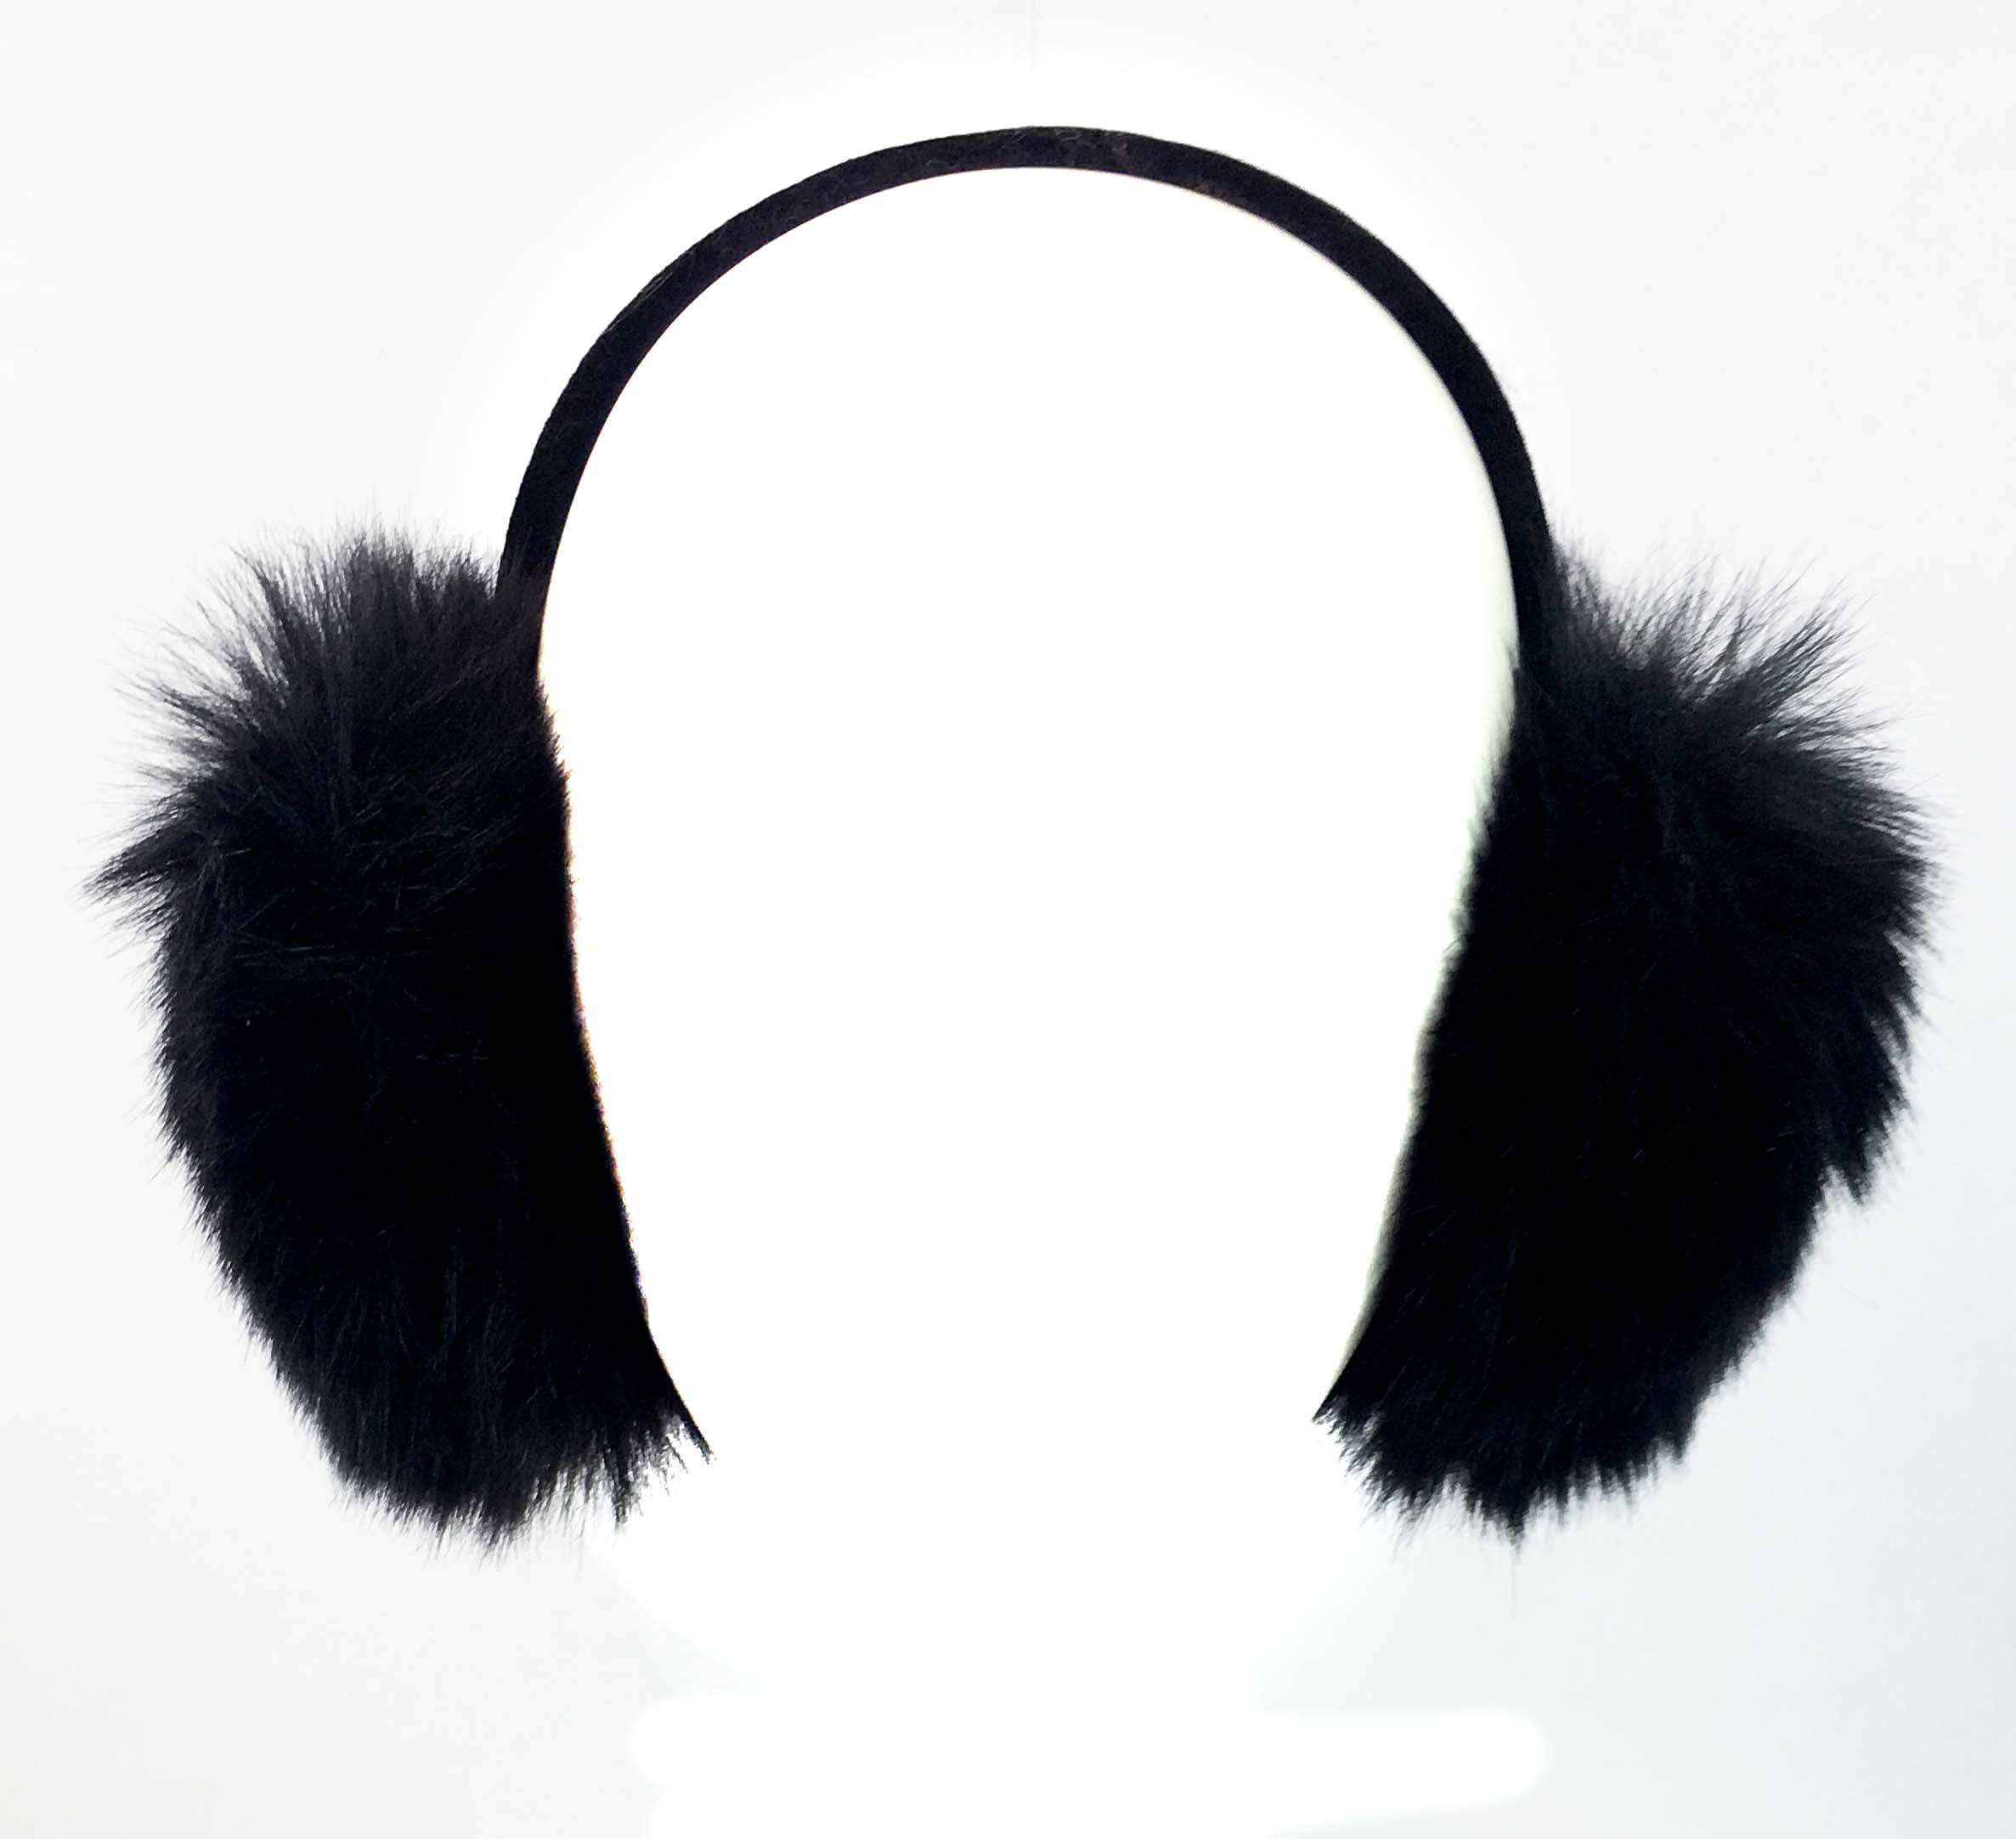 Surell Genuine Faux Fox Earmuff with Velvet Band, Winter Fashion Ear Warmers, Perfect Elegant Women's Luxury Gift (Black)